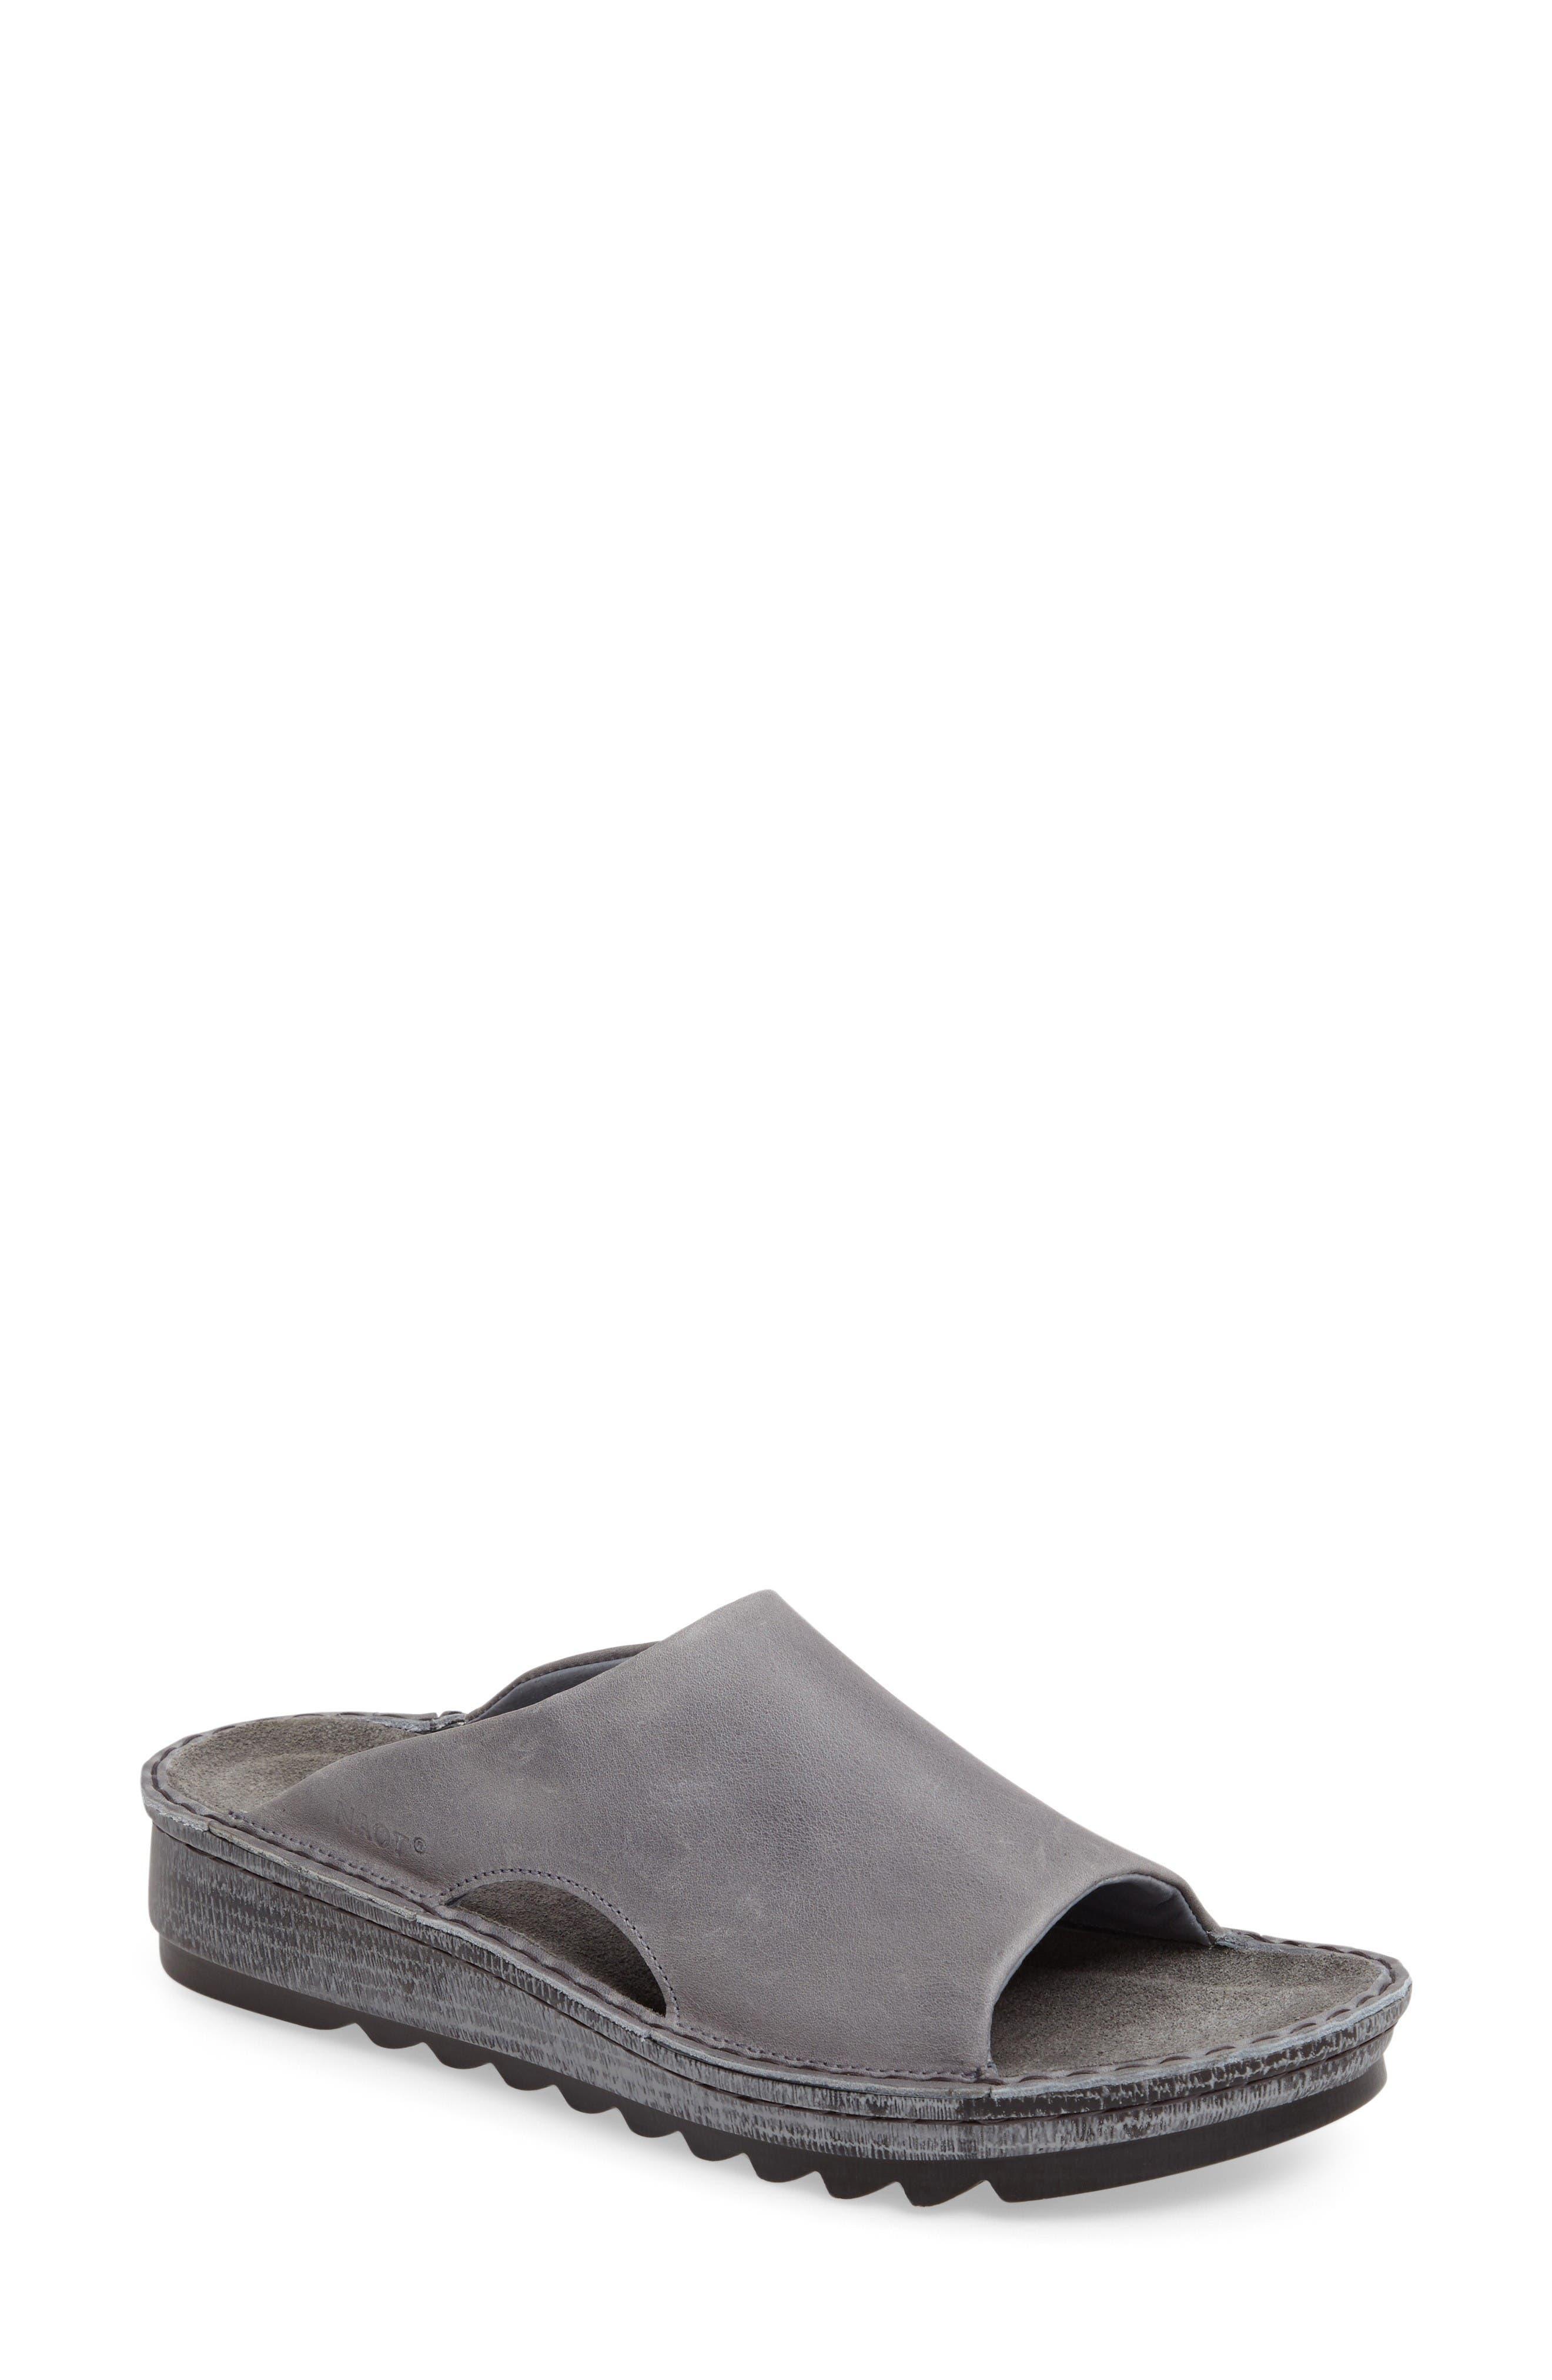 NAOT 'Ardisia' Slide Sandal